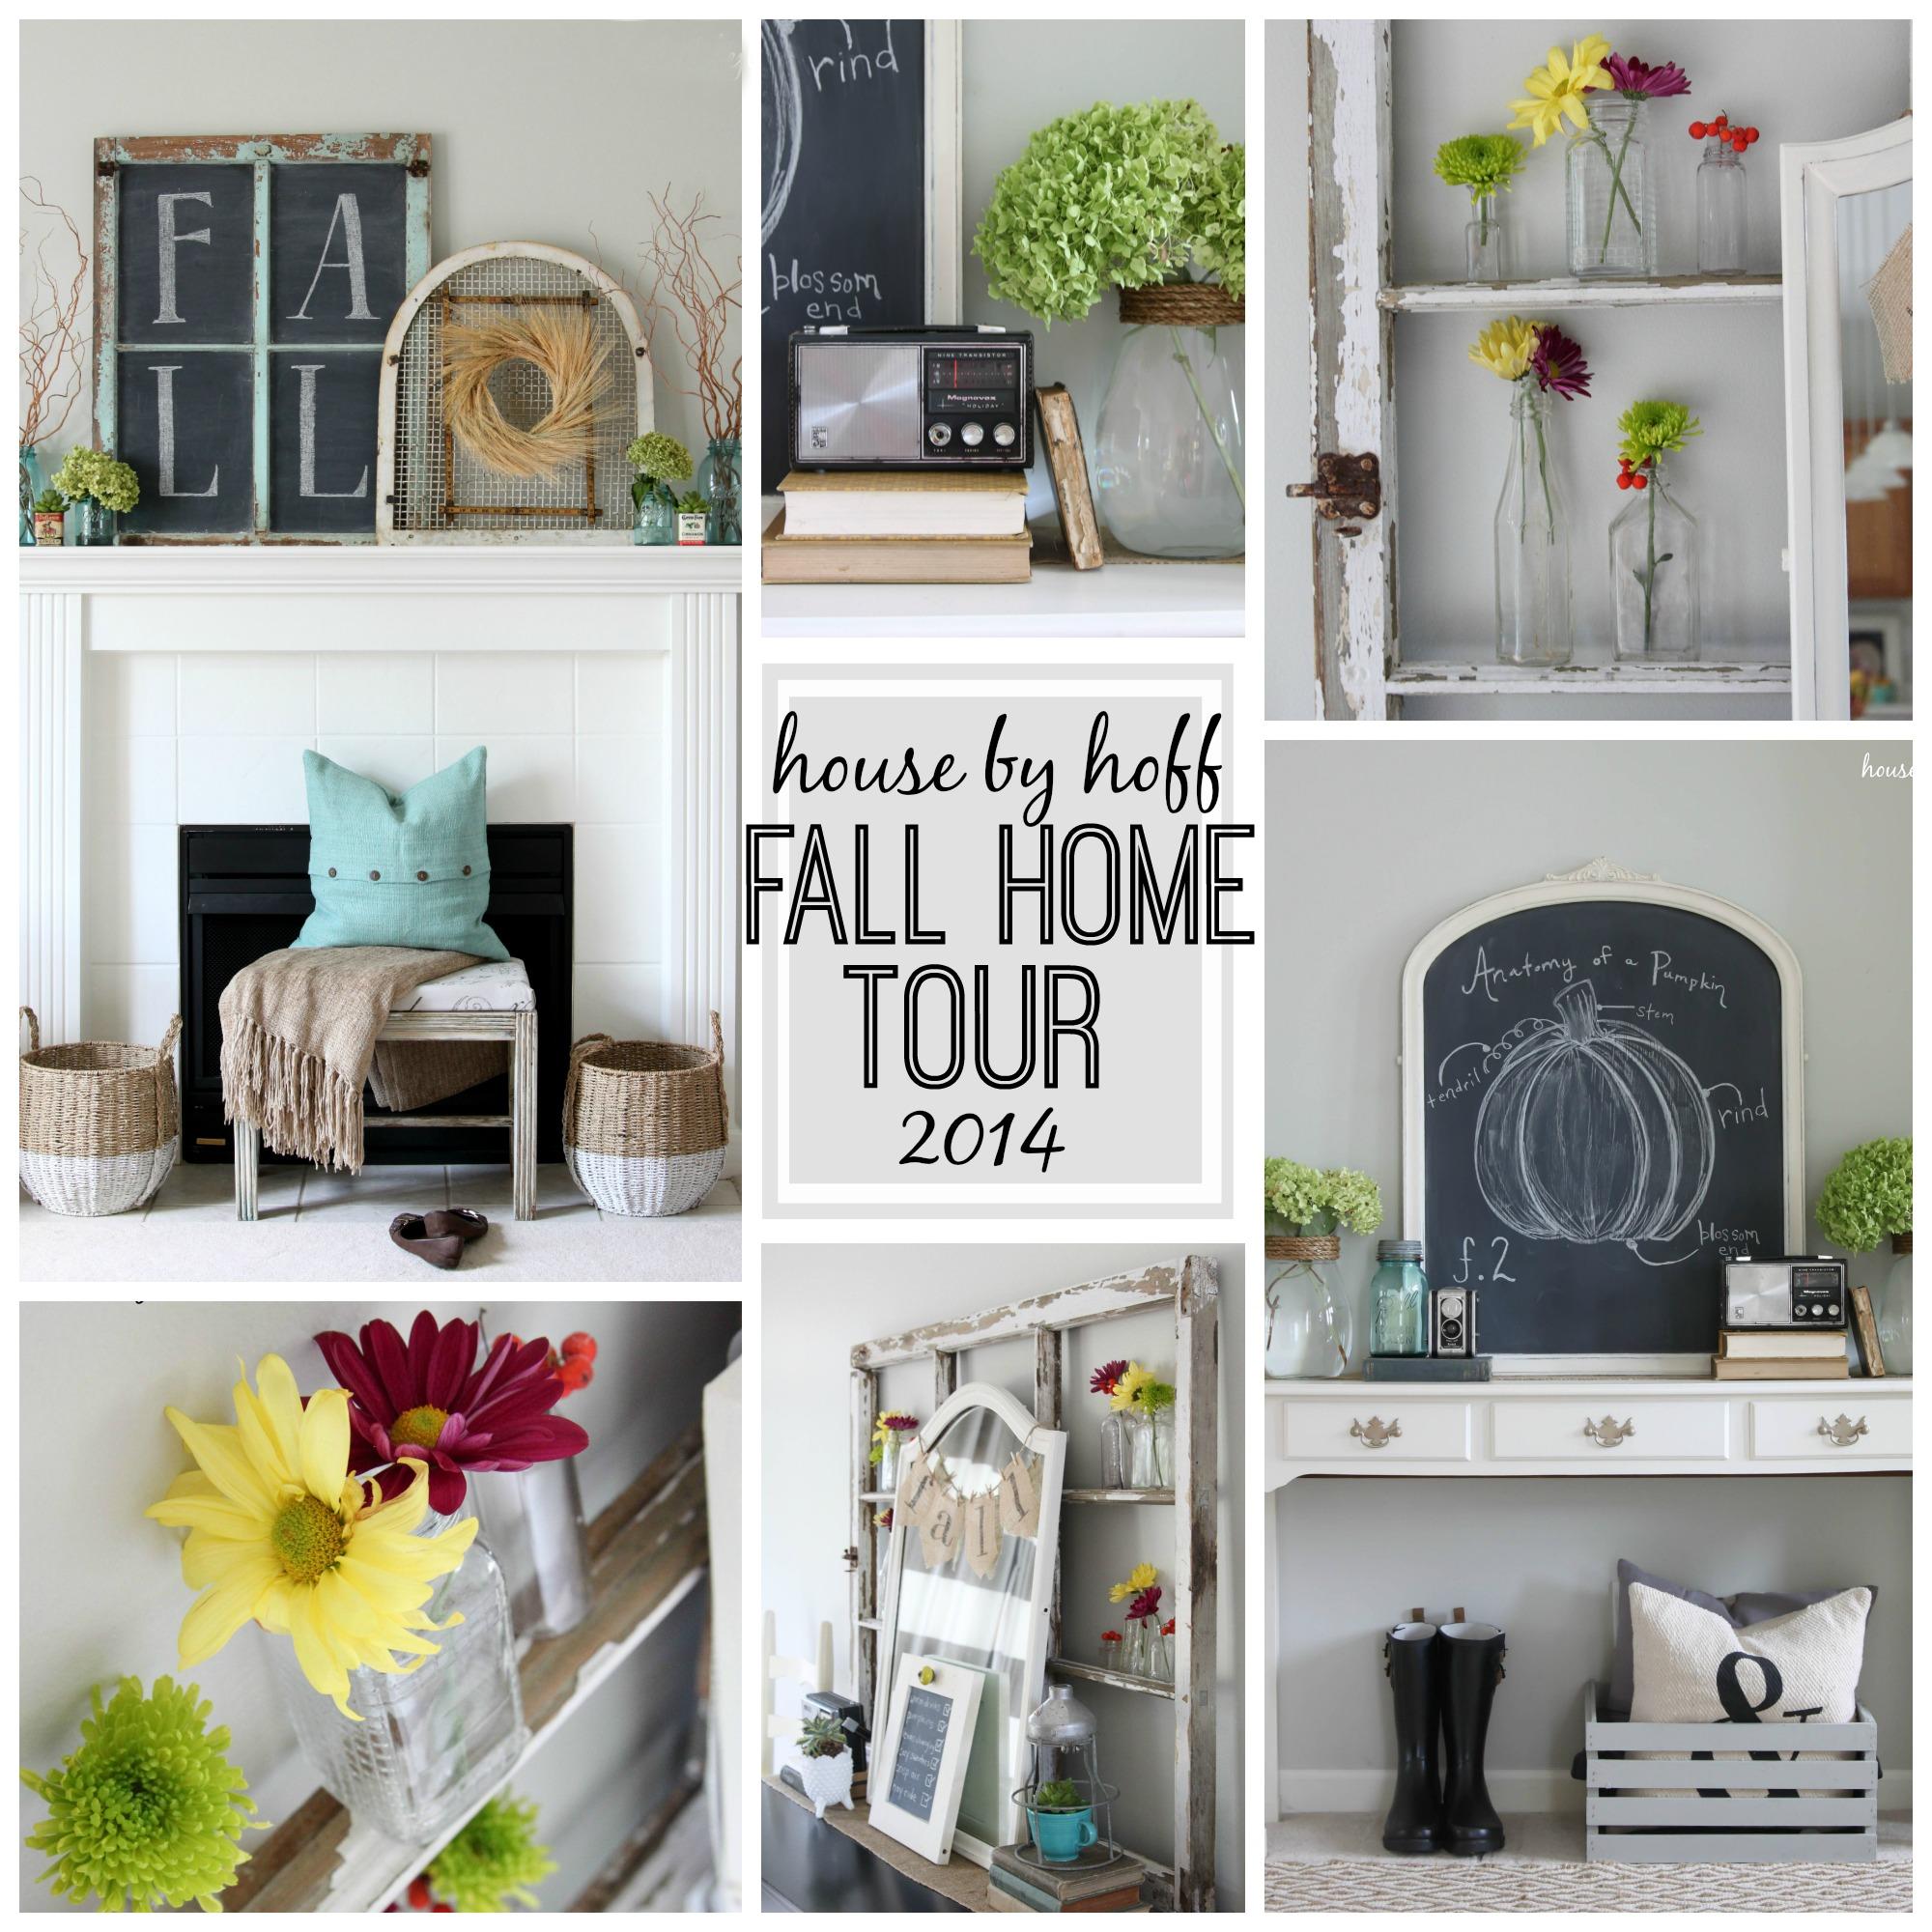 A Warm Rug Some Fall Primping Home Decor: Fall Home Tour